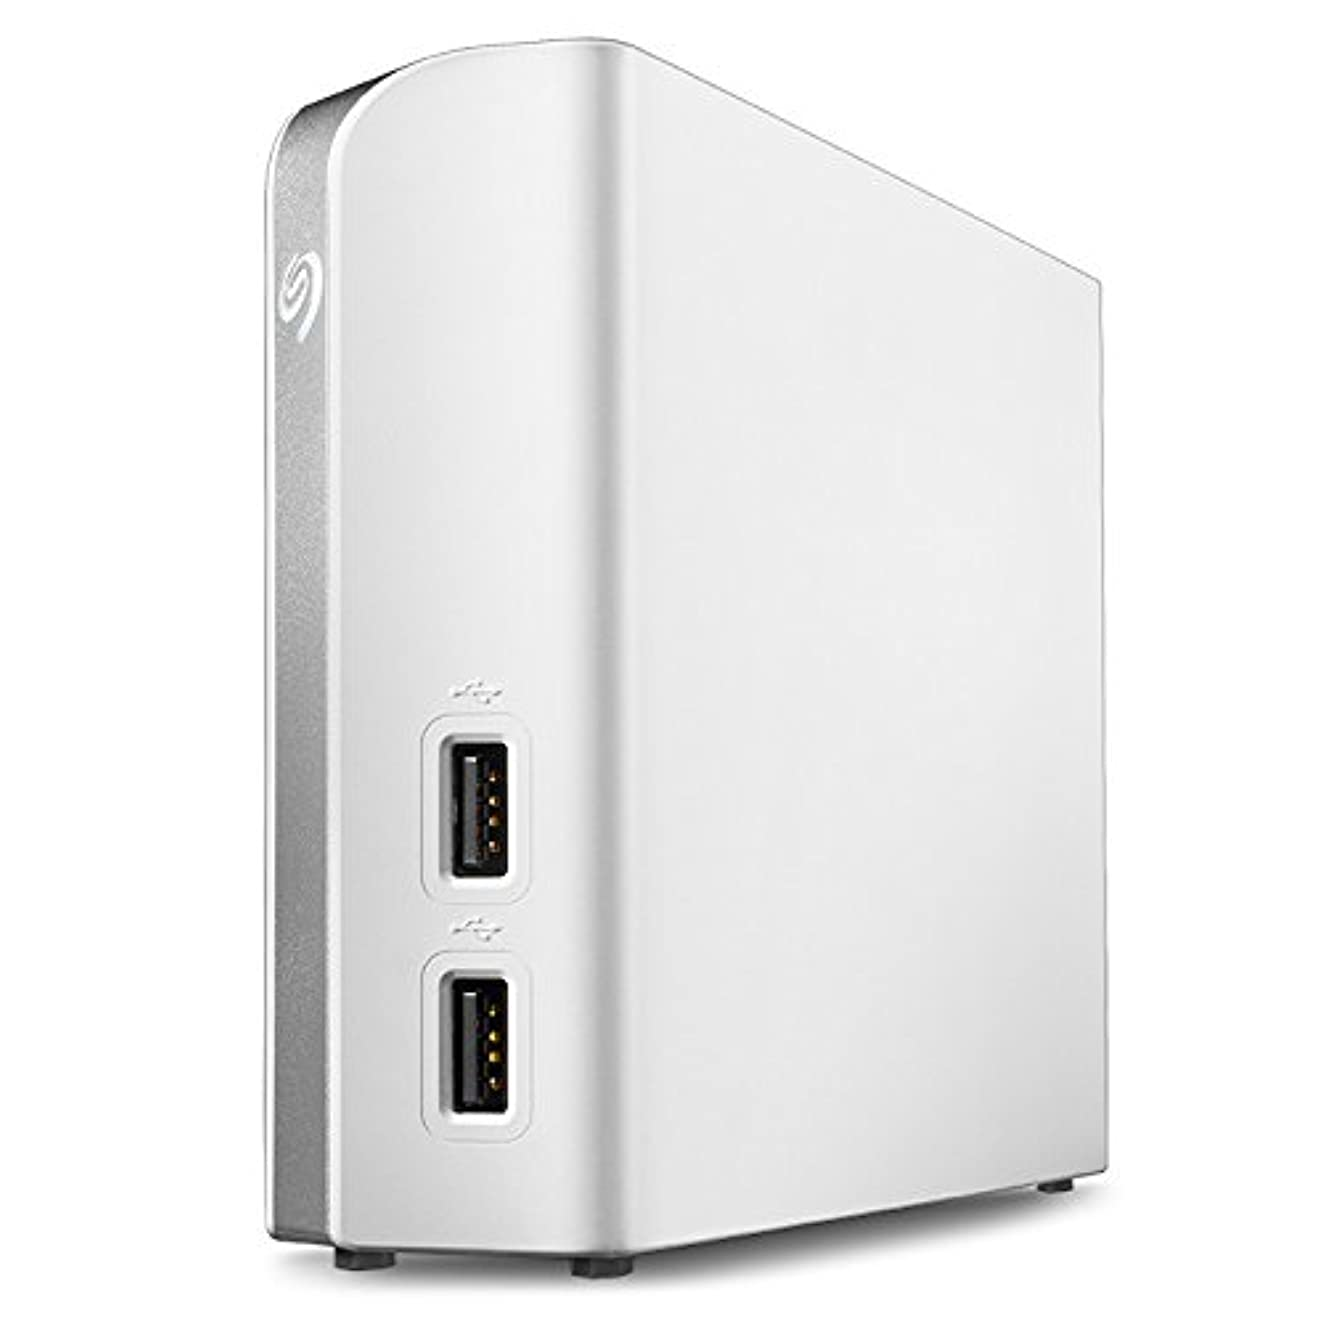 Seagate Backup Plus Hub for Mac 8TB External Hard Drive Desktop HDD – USB 3.0, 2 USB Ports, for Computer Desktop Workstation PC Laptop Mac, 2 Months Adobe CC Photography (STEM8000400)